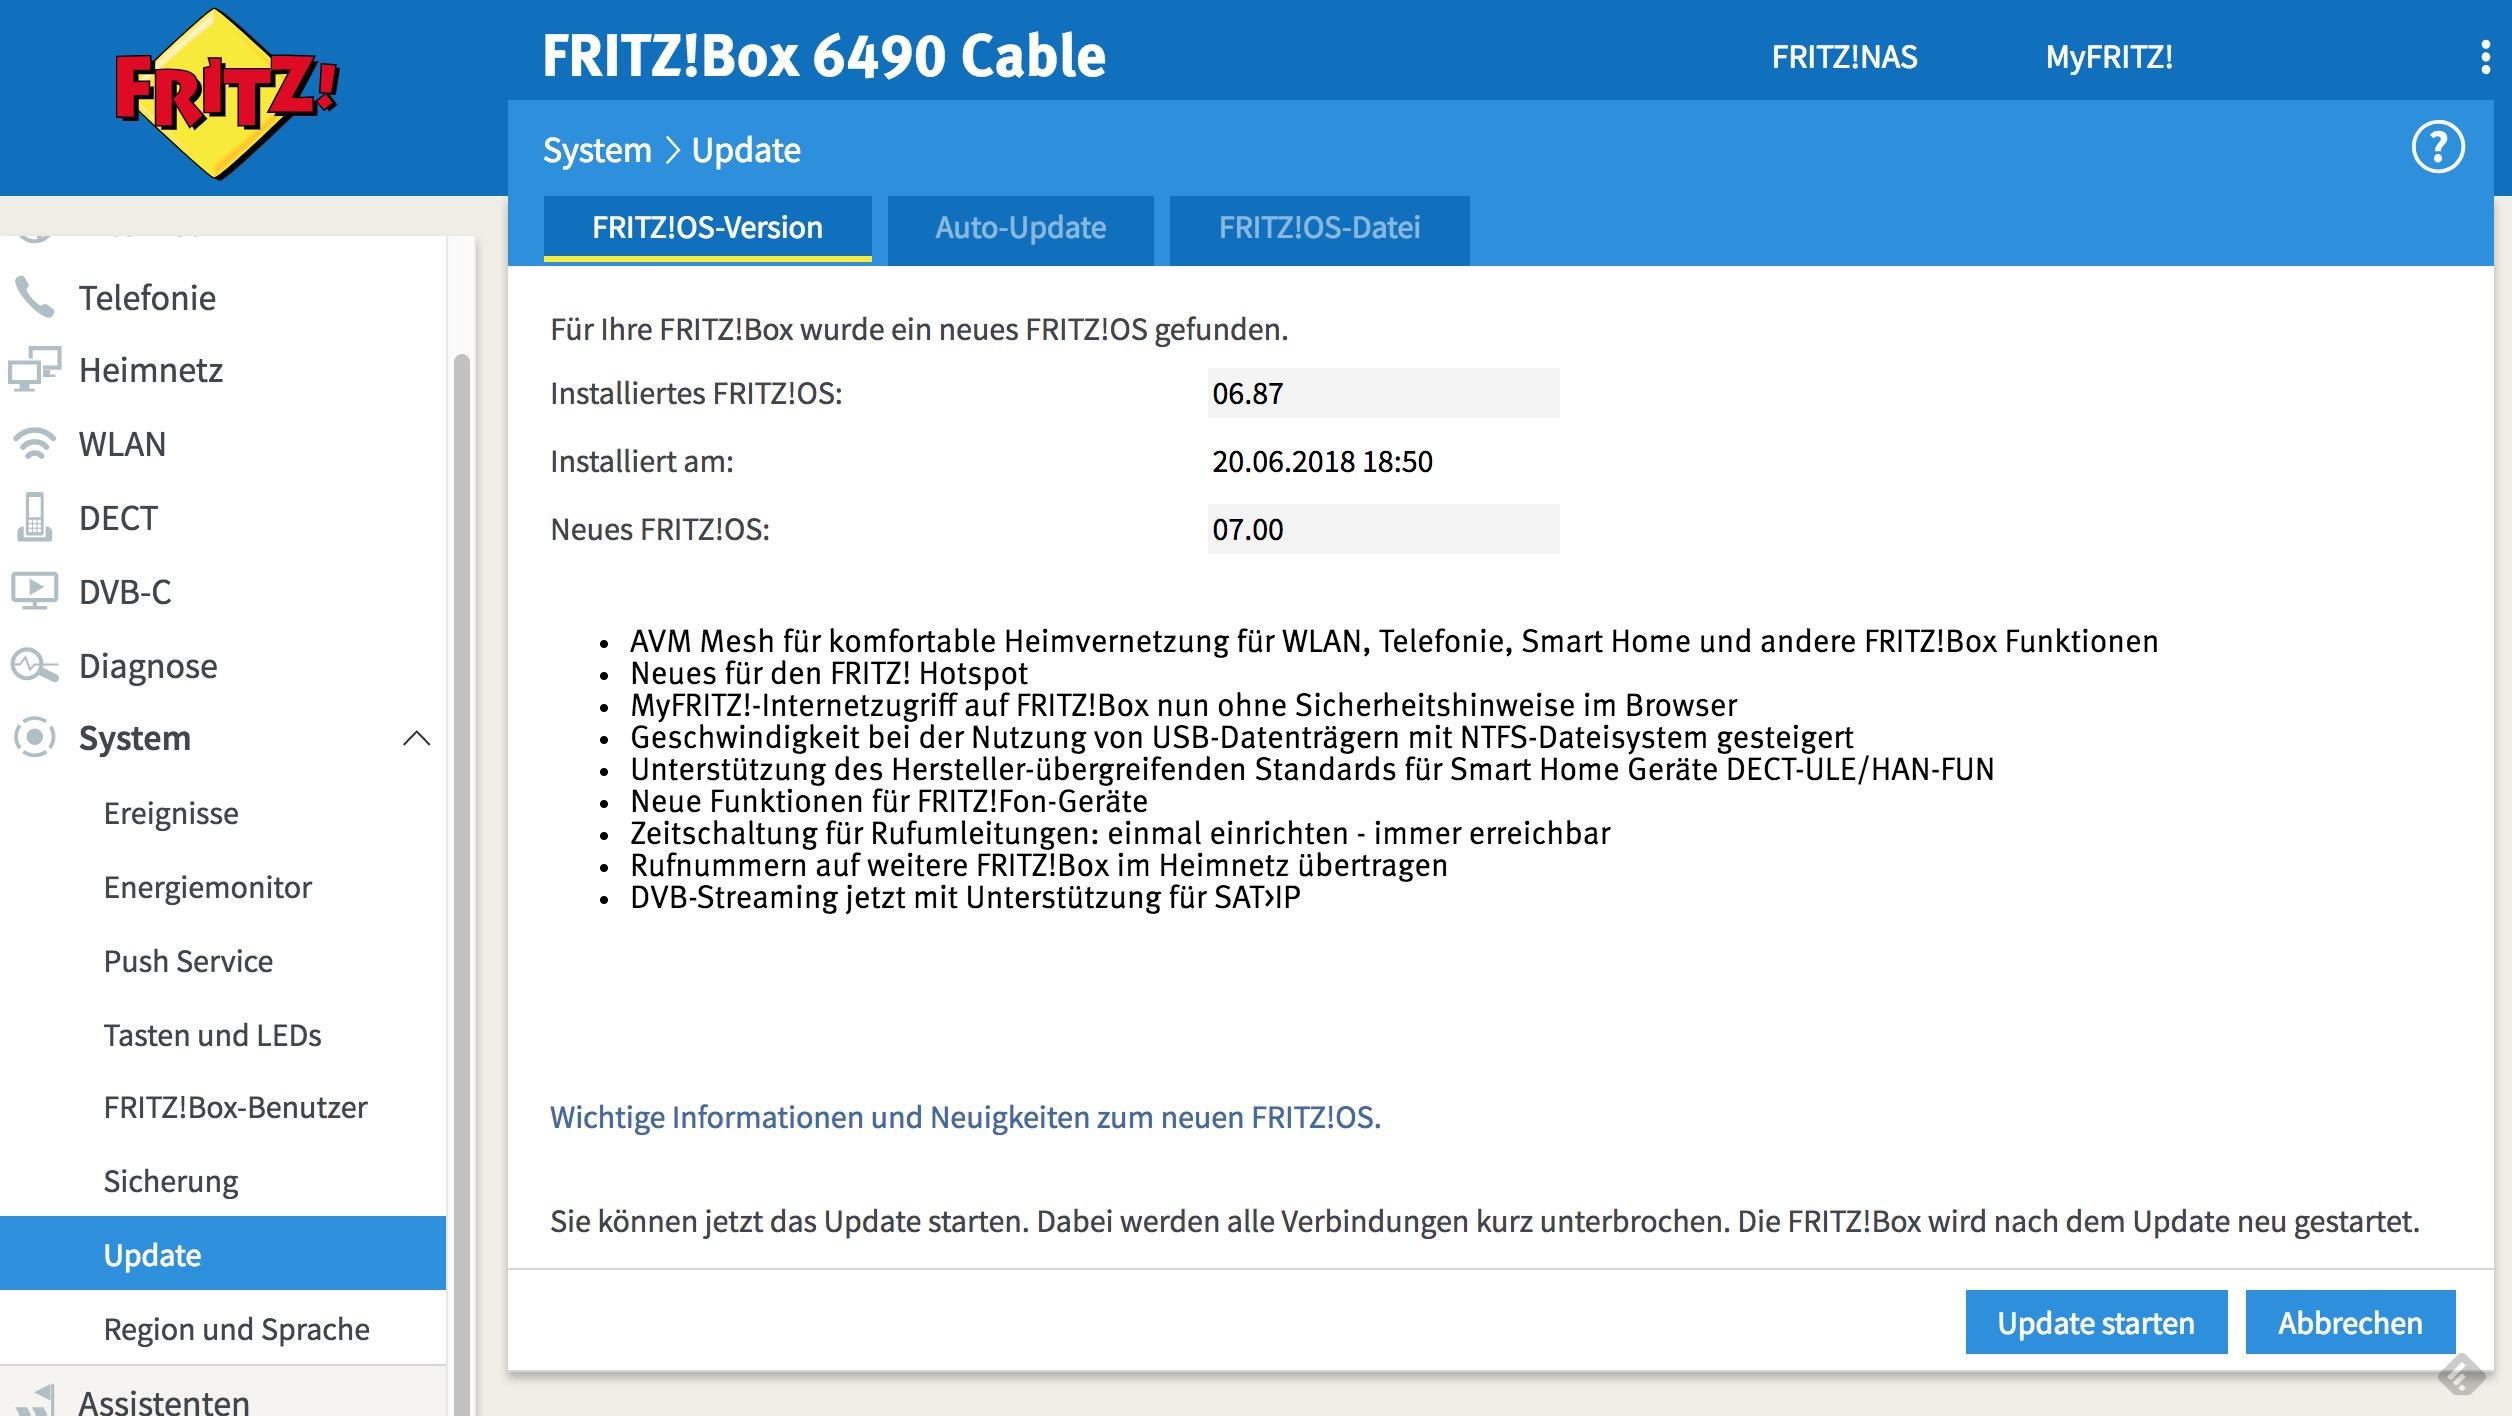 FRITZ!Box 6490 Cable - AVM veröffentlicht FRITZ!OS 7